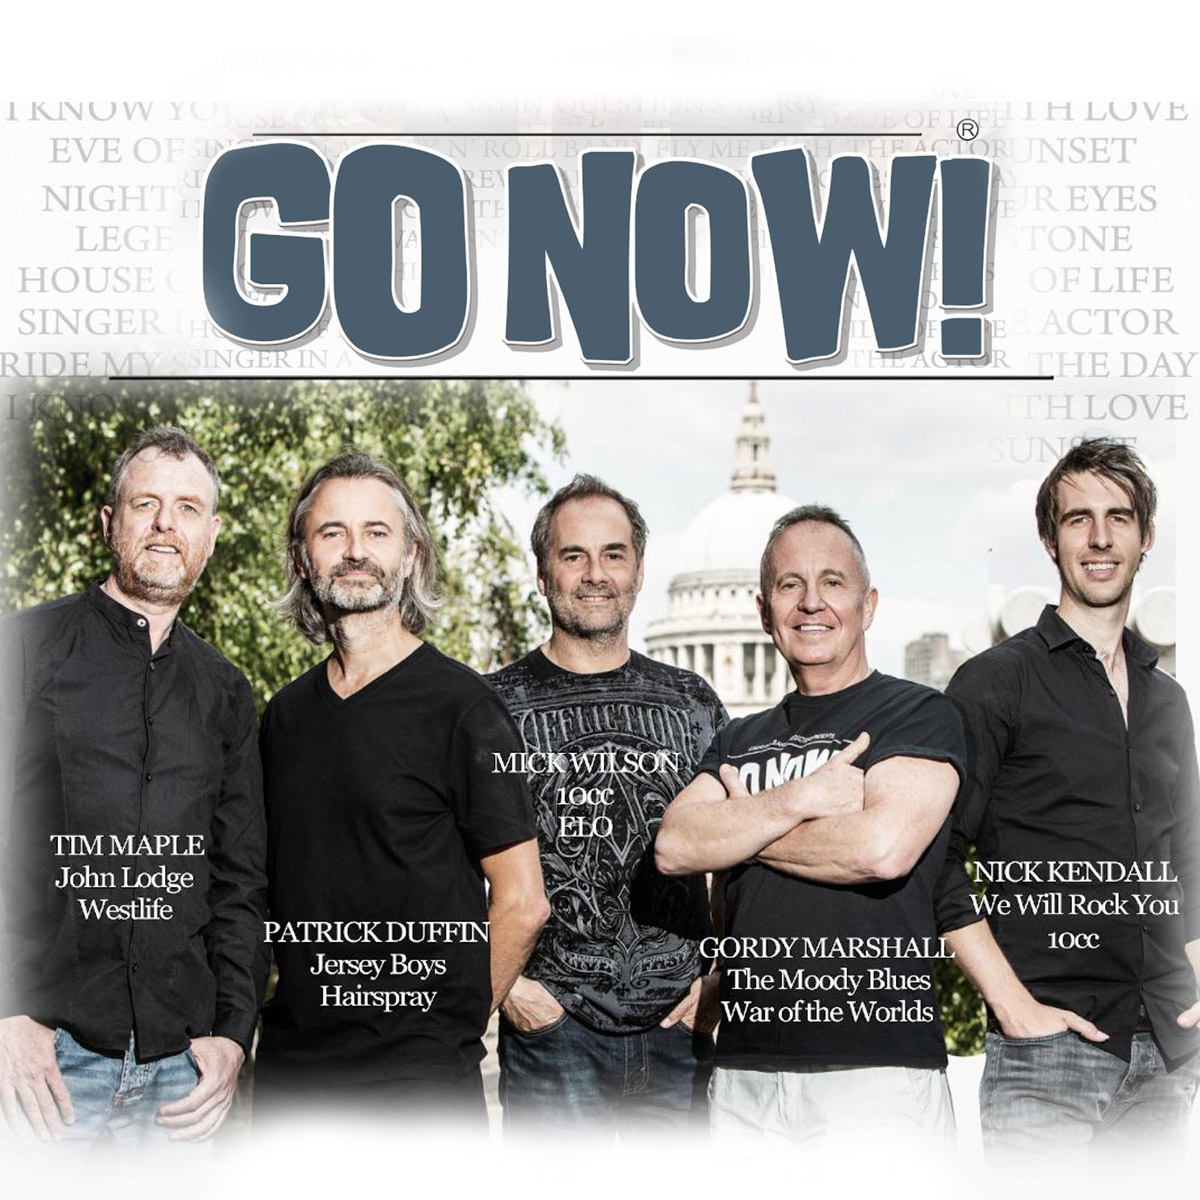 GO NOW! Livestream Concert Fundraiser for Columbia